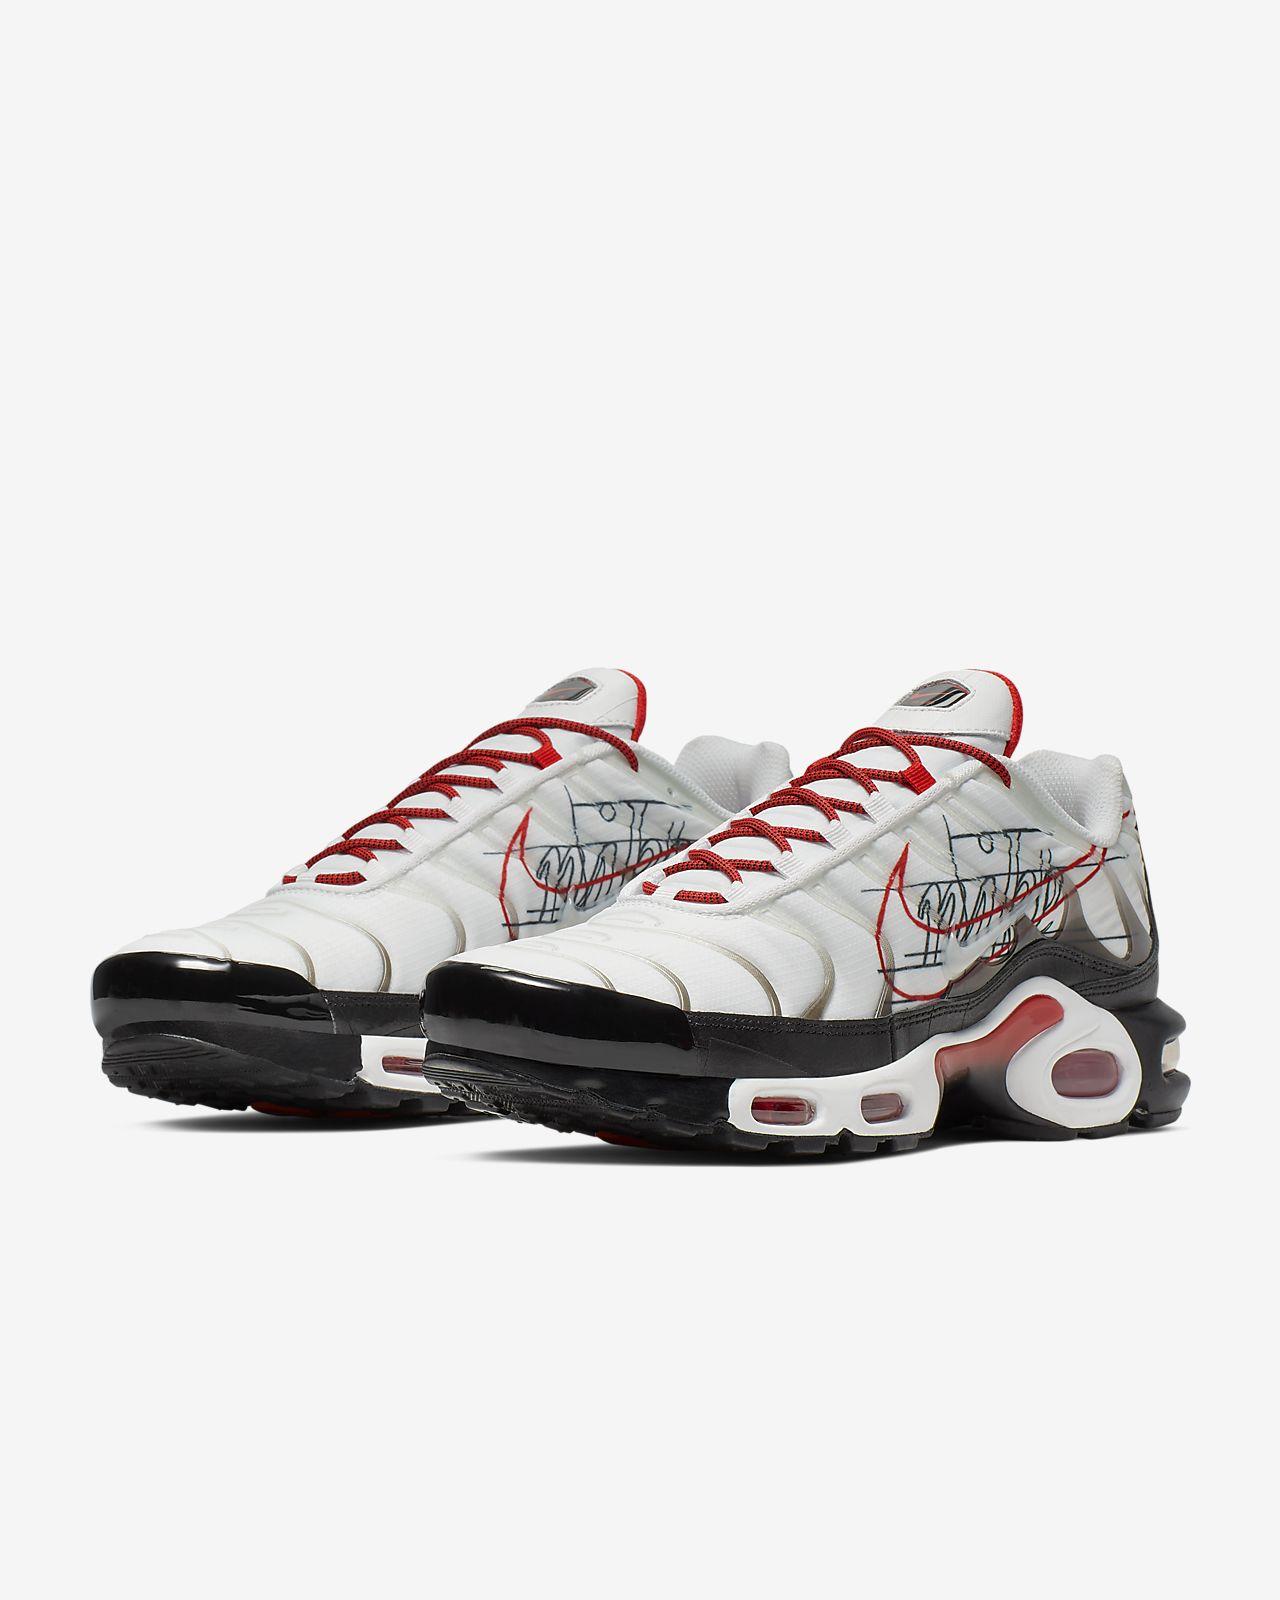 Hommes Nike Air Max2 Light Chaussures 104042 00500 blanc